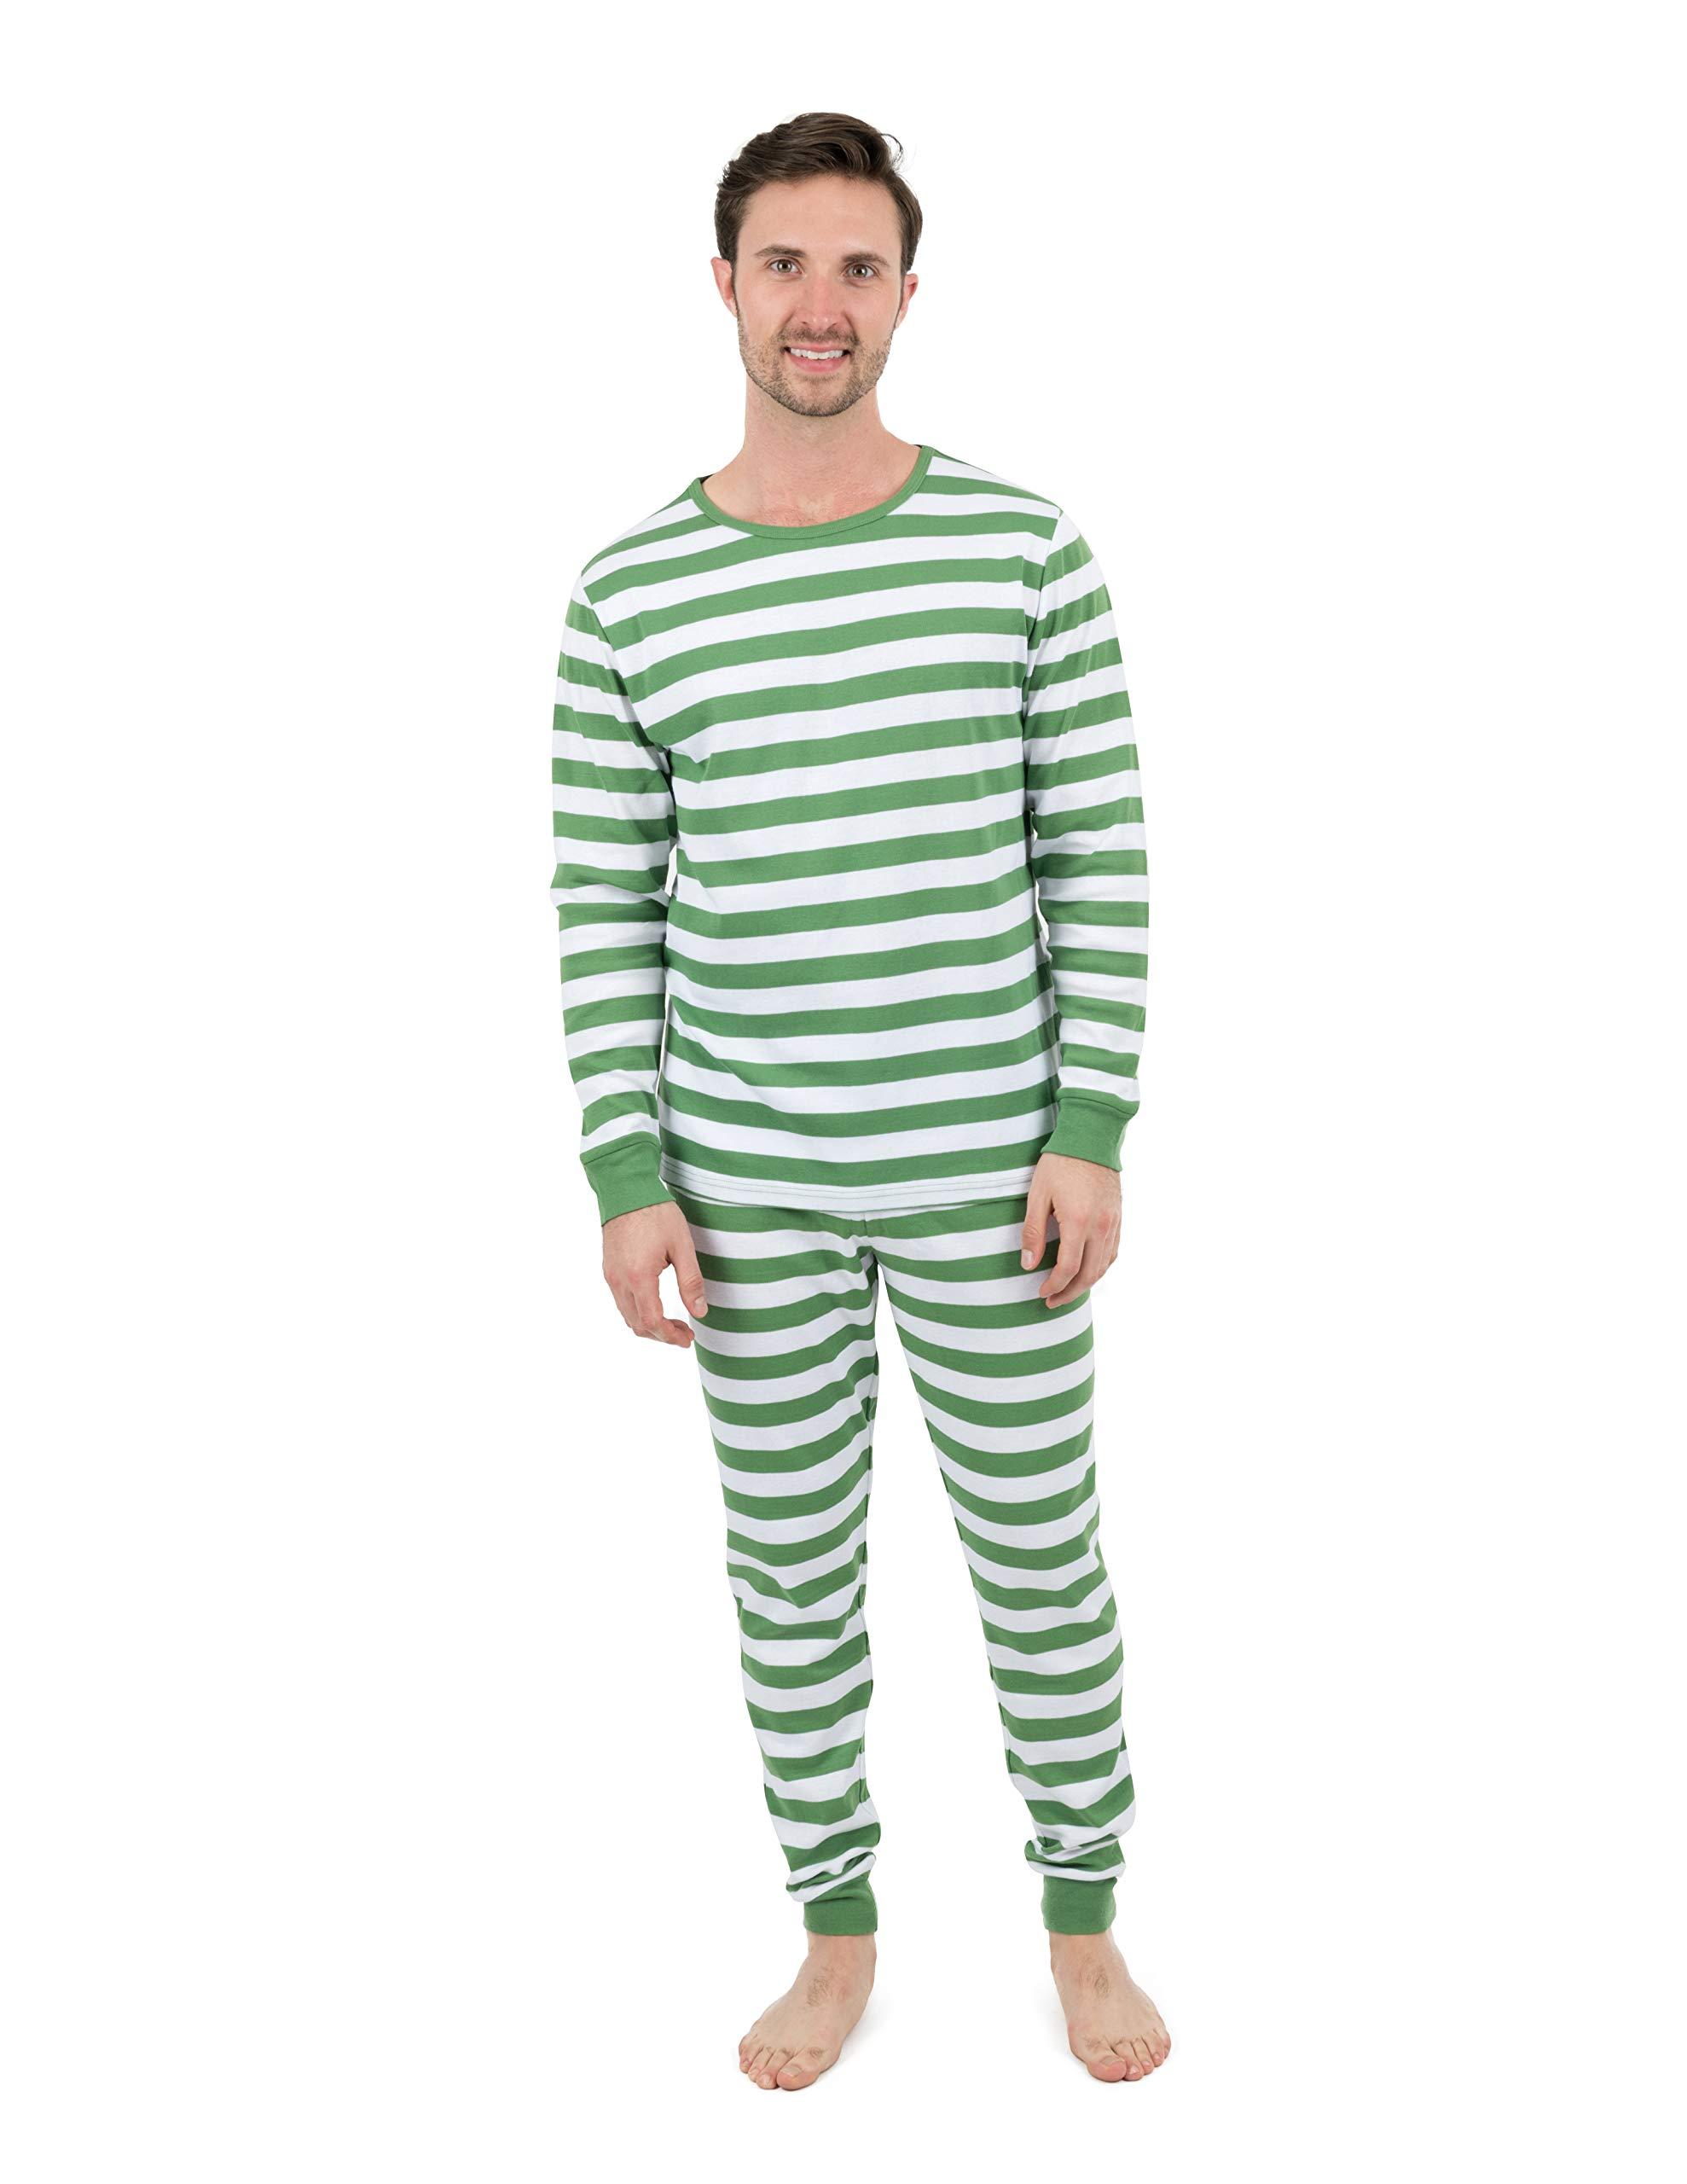 2ecae5a3ba Leveret Mens Pajamas Green White Stripes 2 Piece Pajama Set 100% Cotton Size  XX-Large